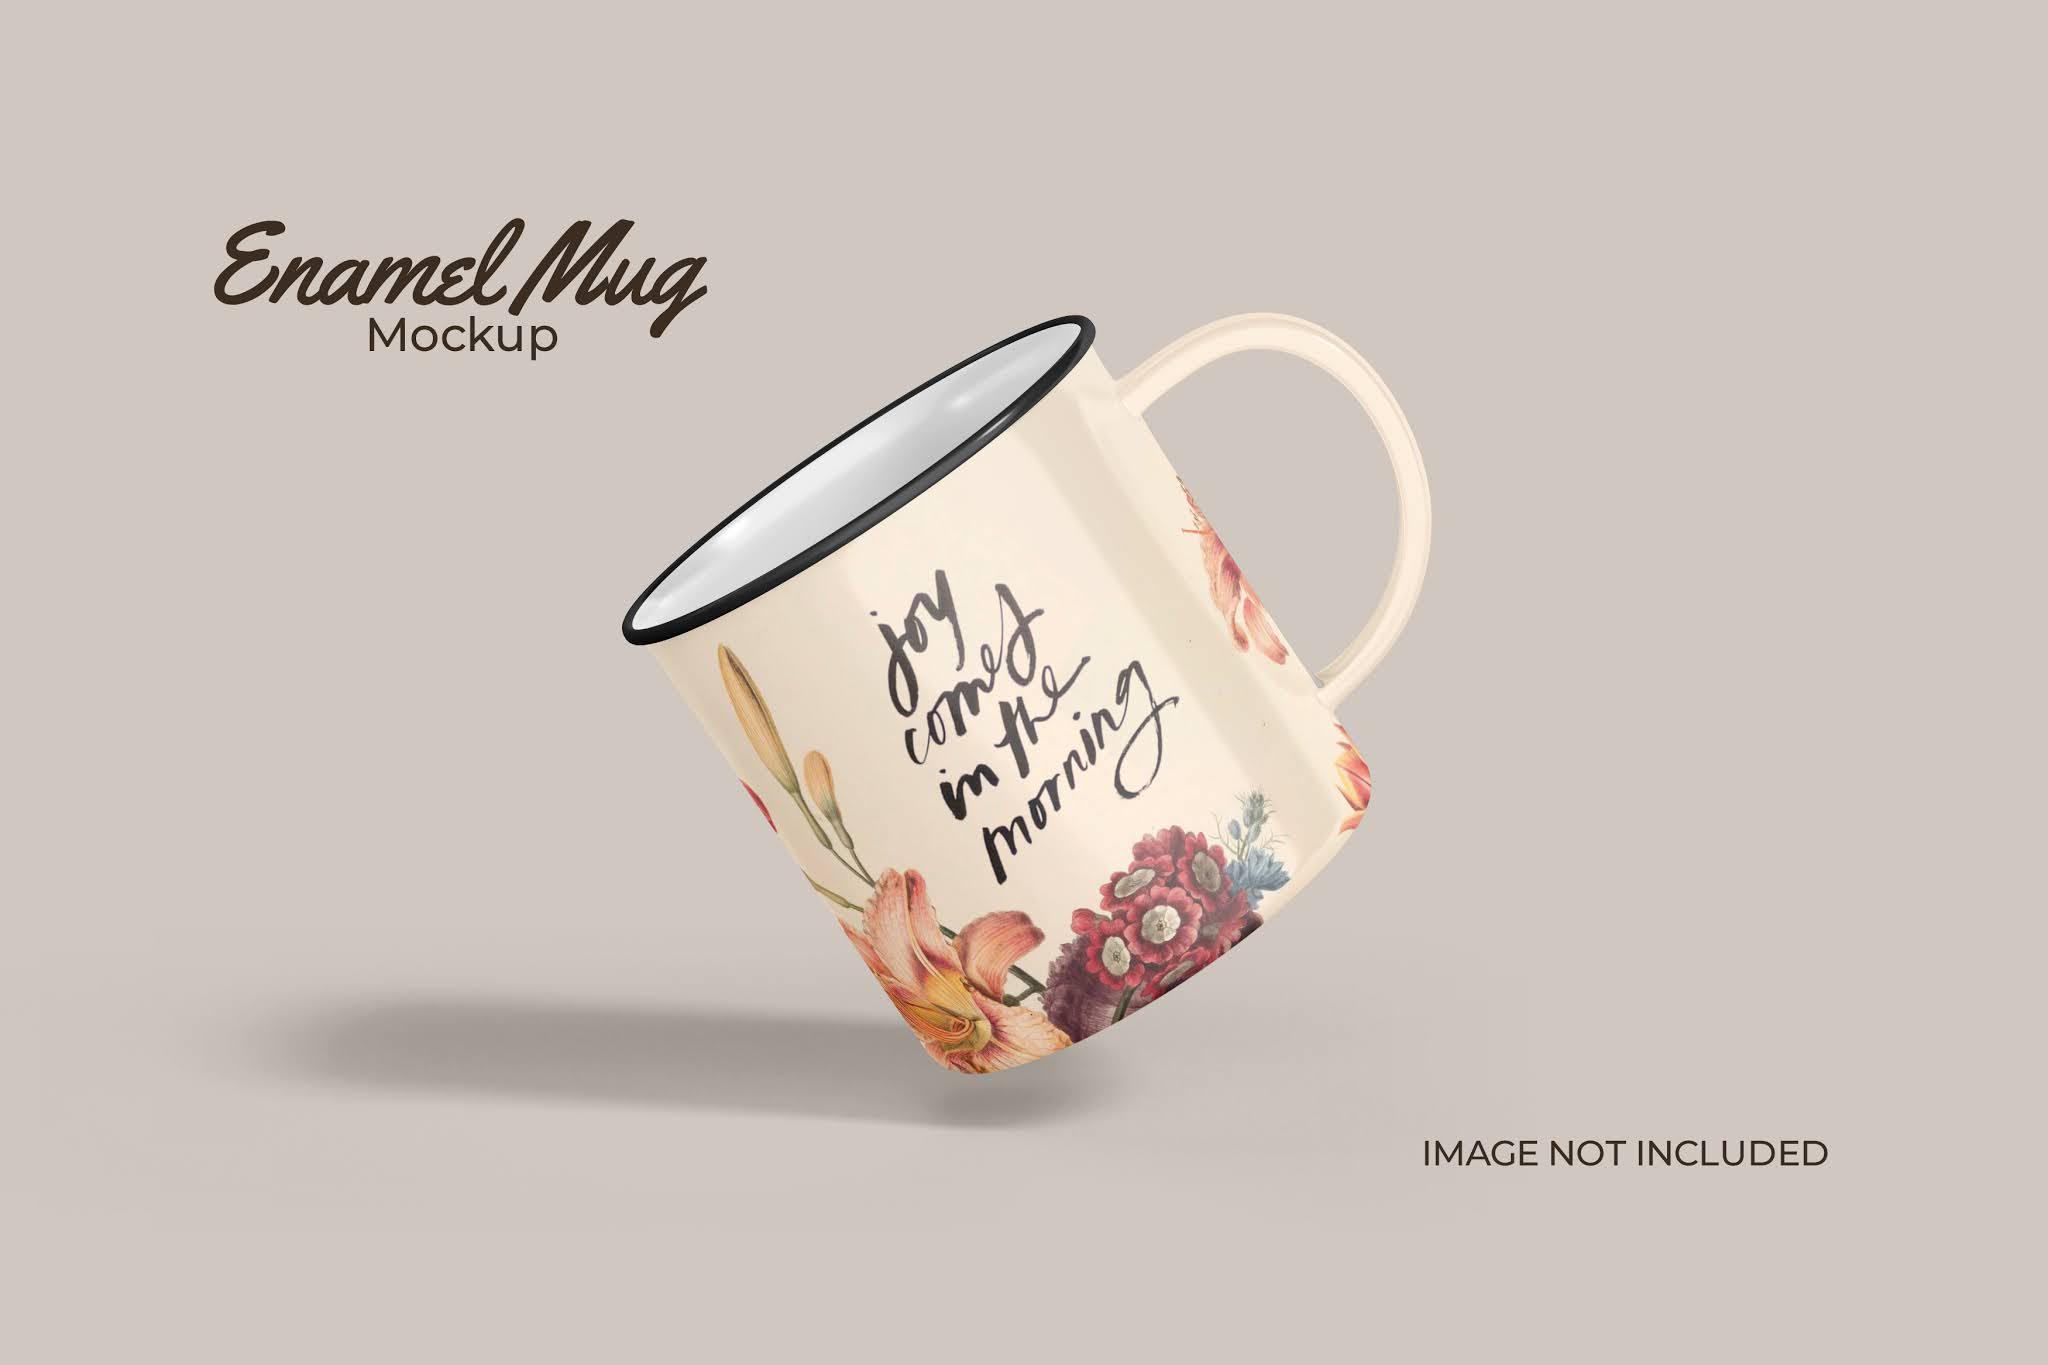 Classic Enamel Mug Mockup in PSD Format